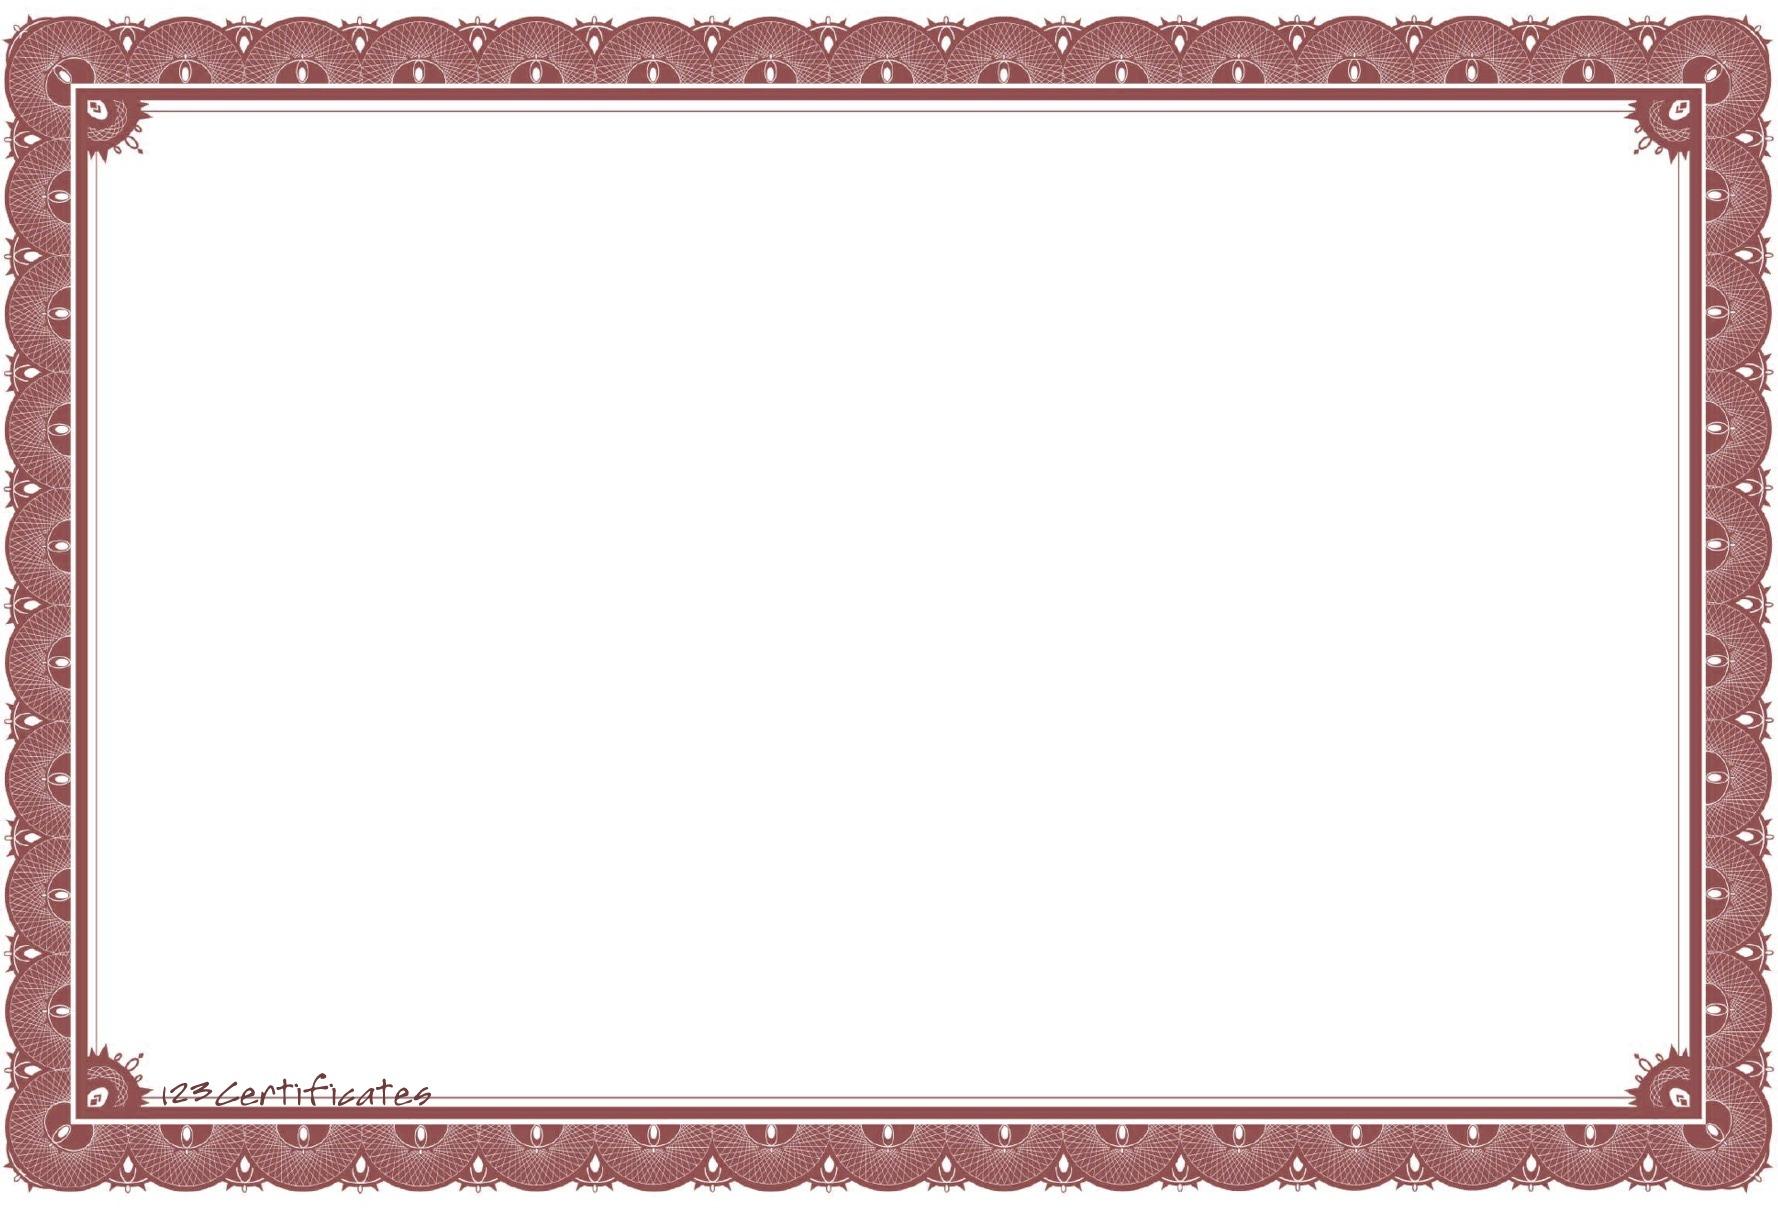 art certificate template free certificate borders certificate .